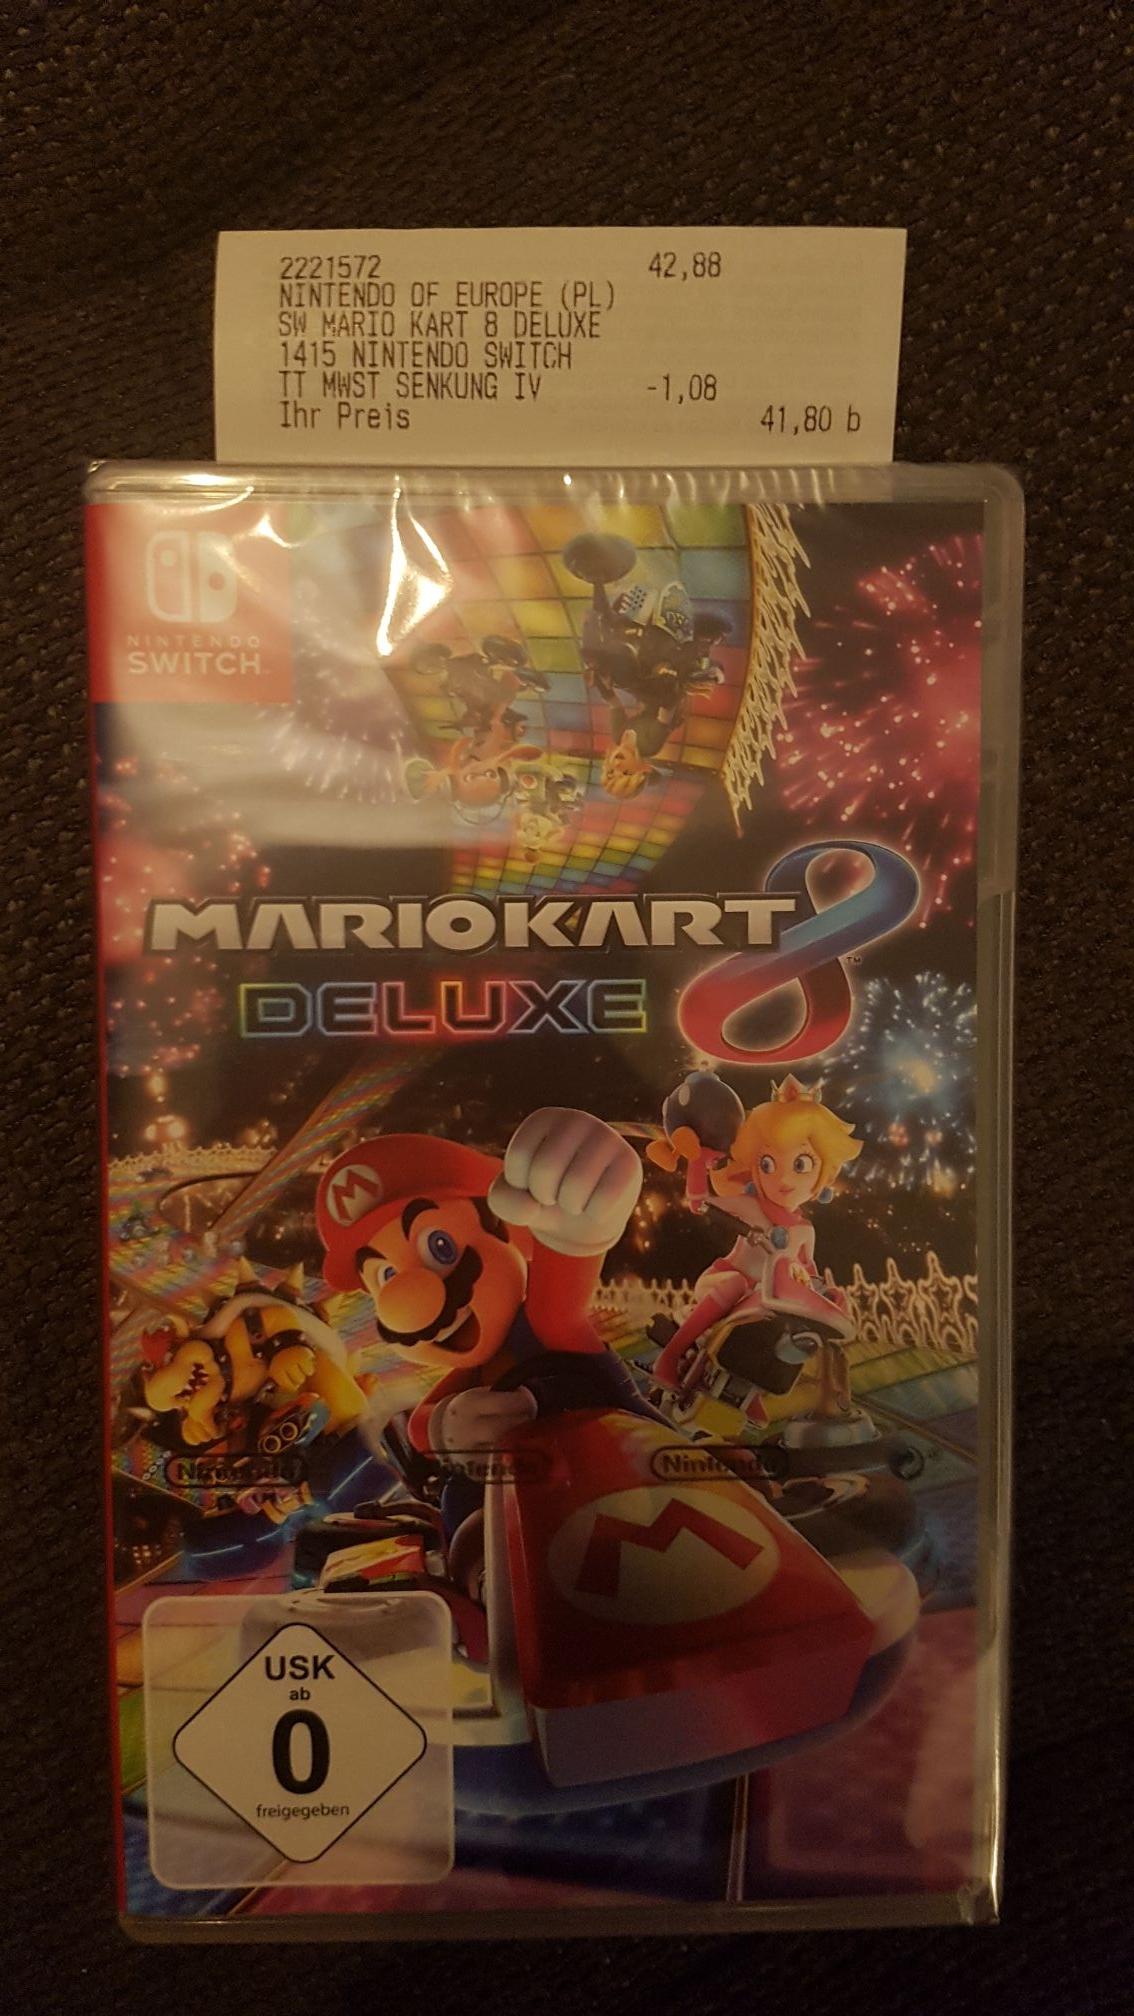 (Lokal) Media Markt Mario Kart 8 Deluxe für Nintendo Switch - Konstanz